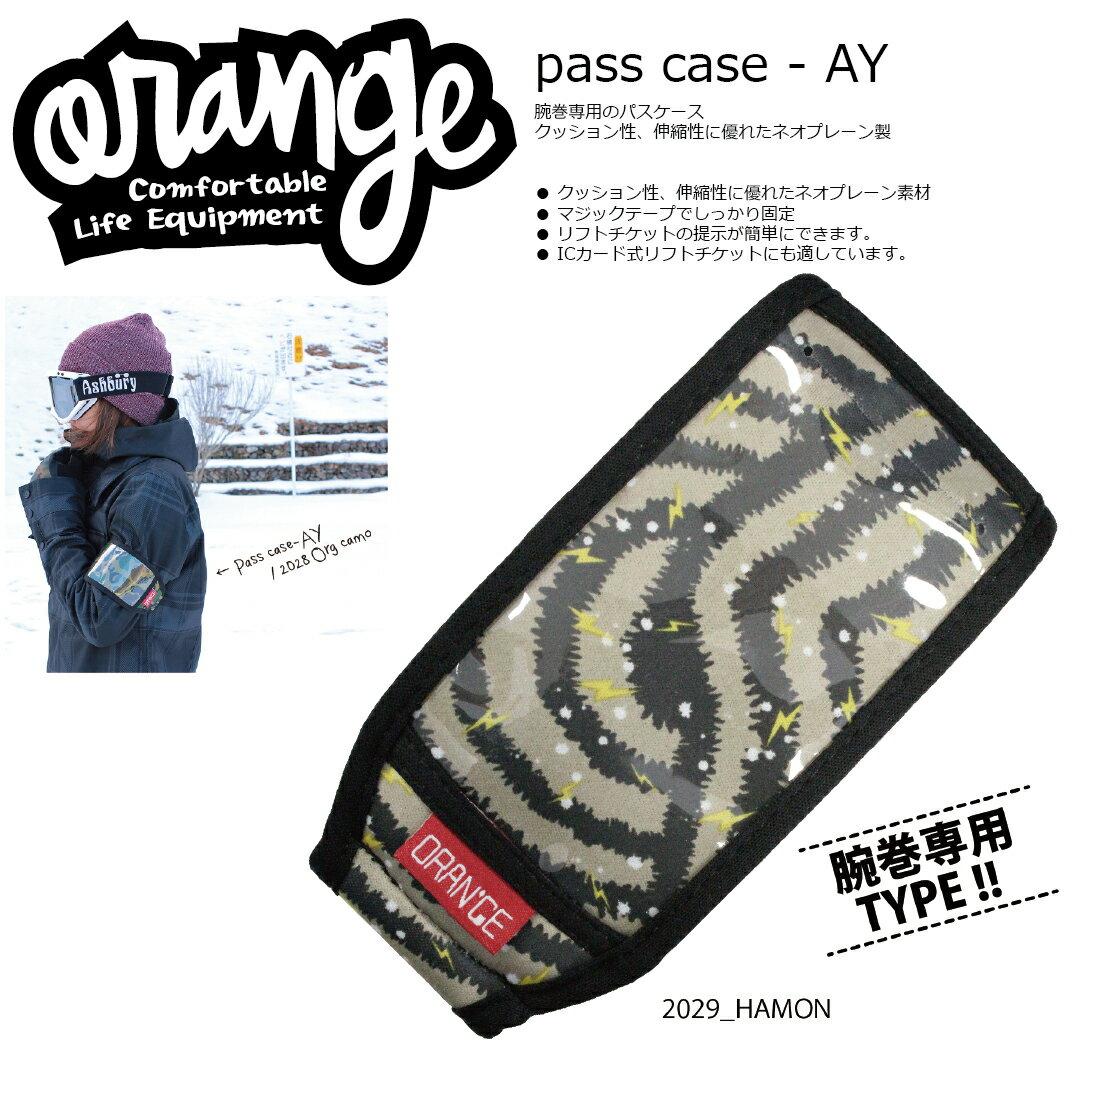 Oran'ge Pass-Case AY 2029 HAMON オレンジ パスケース エーワイ うで装着タイプ ヨコ 2017 2017-18